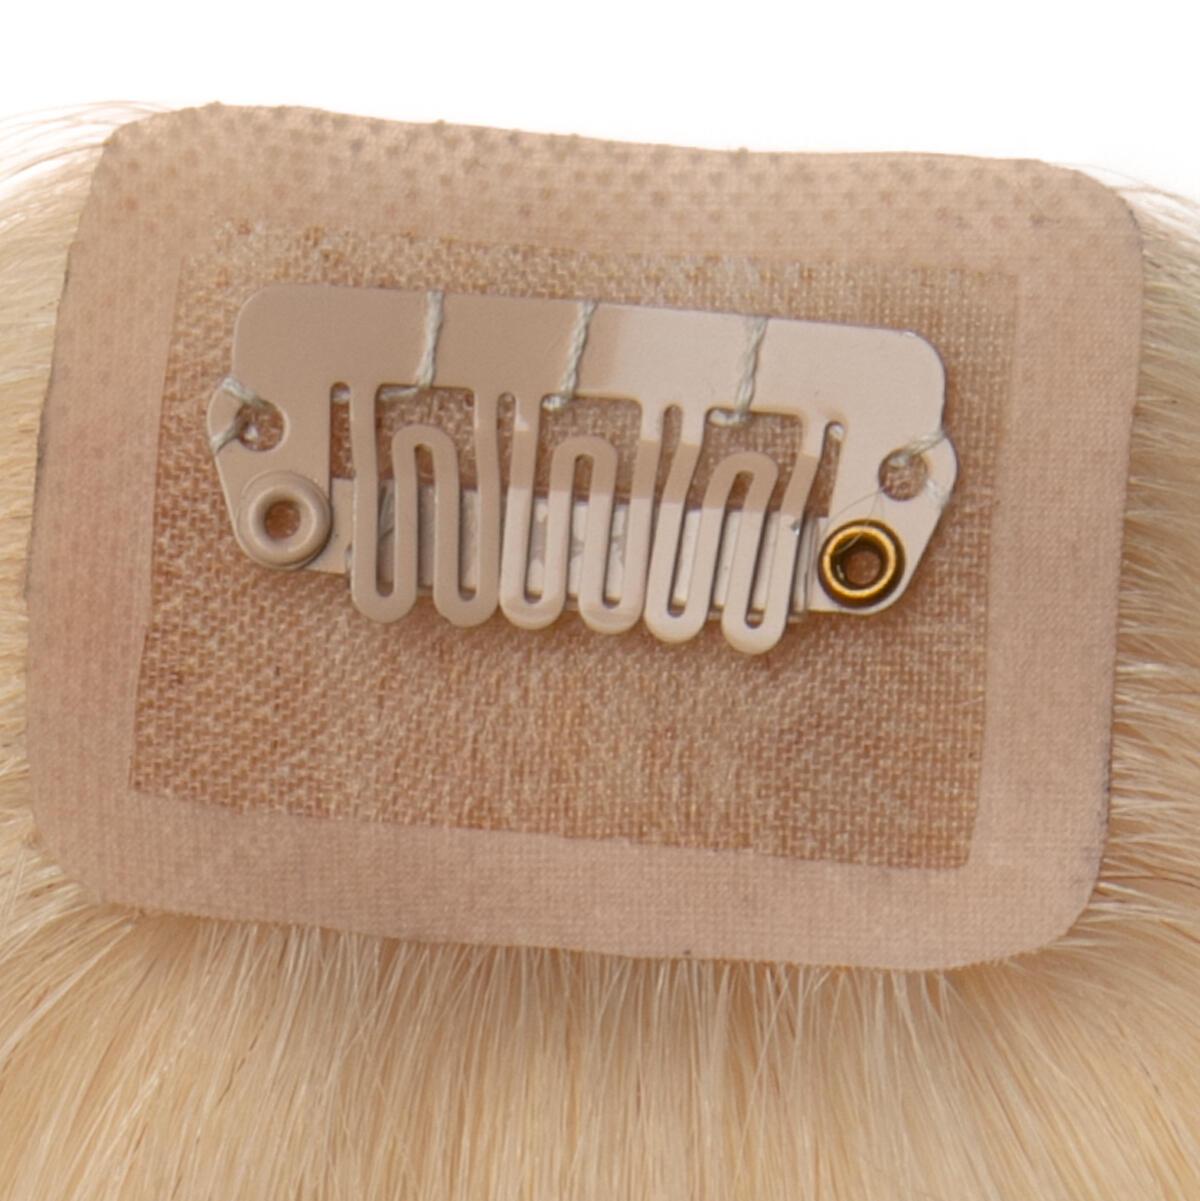 Clip-in Fringe 8.0 Light Golden Blonde 0 cm